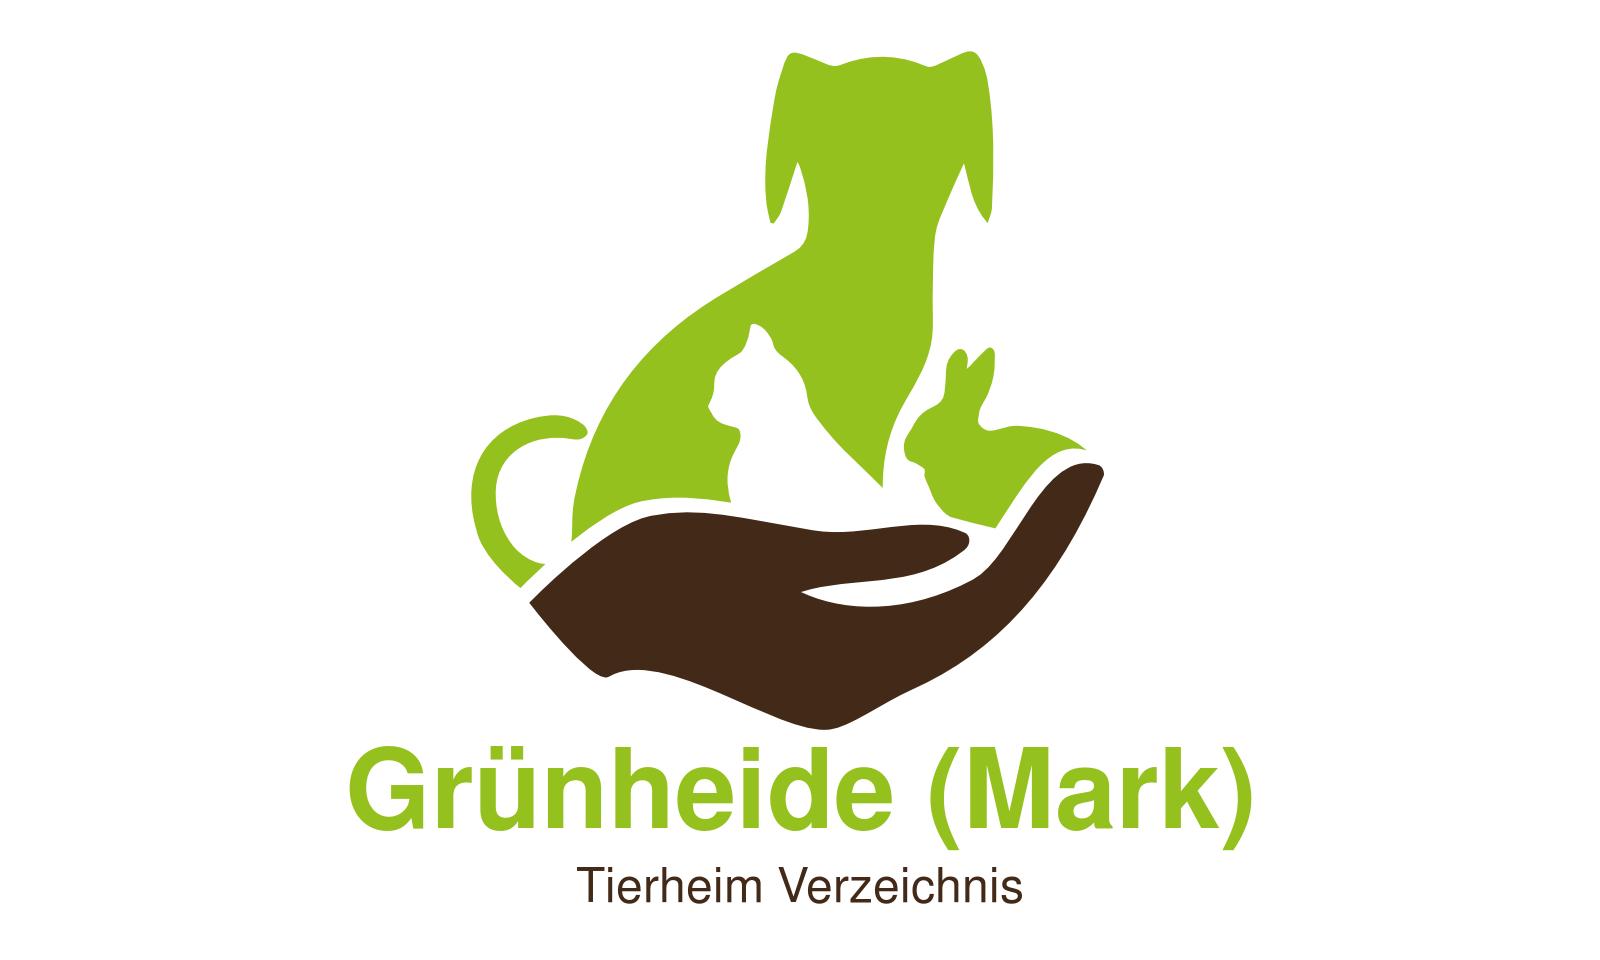 Tierheim Grünheide (Mark)